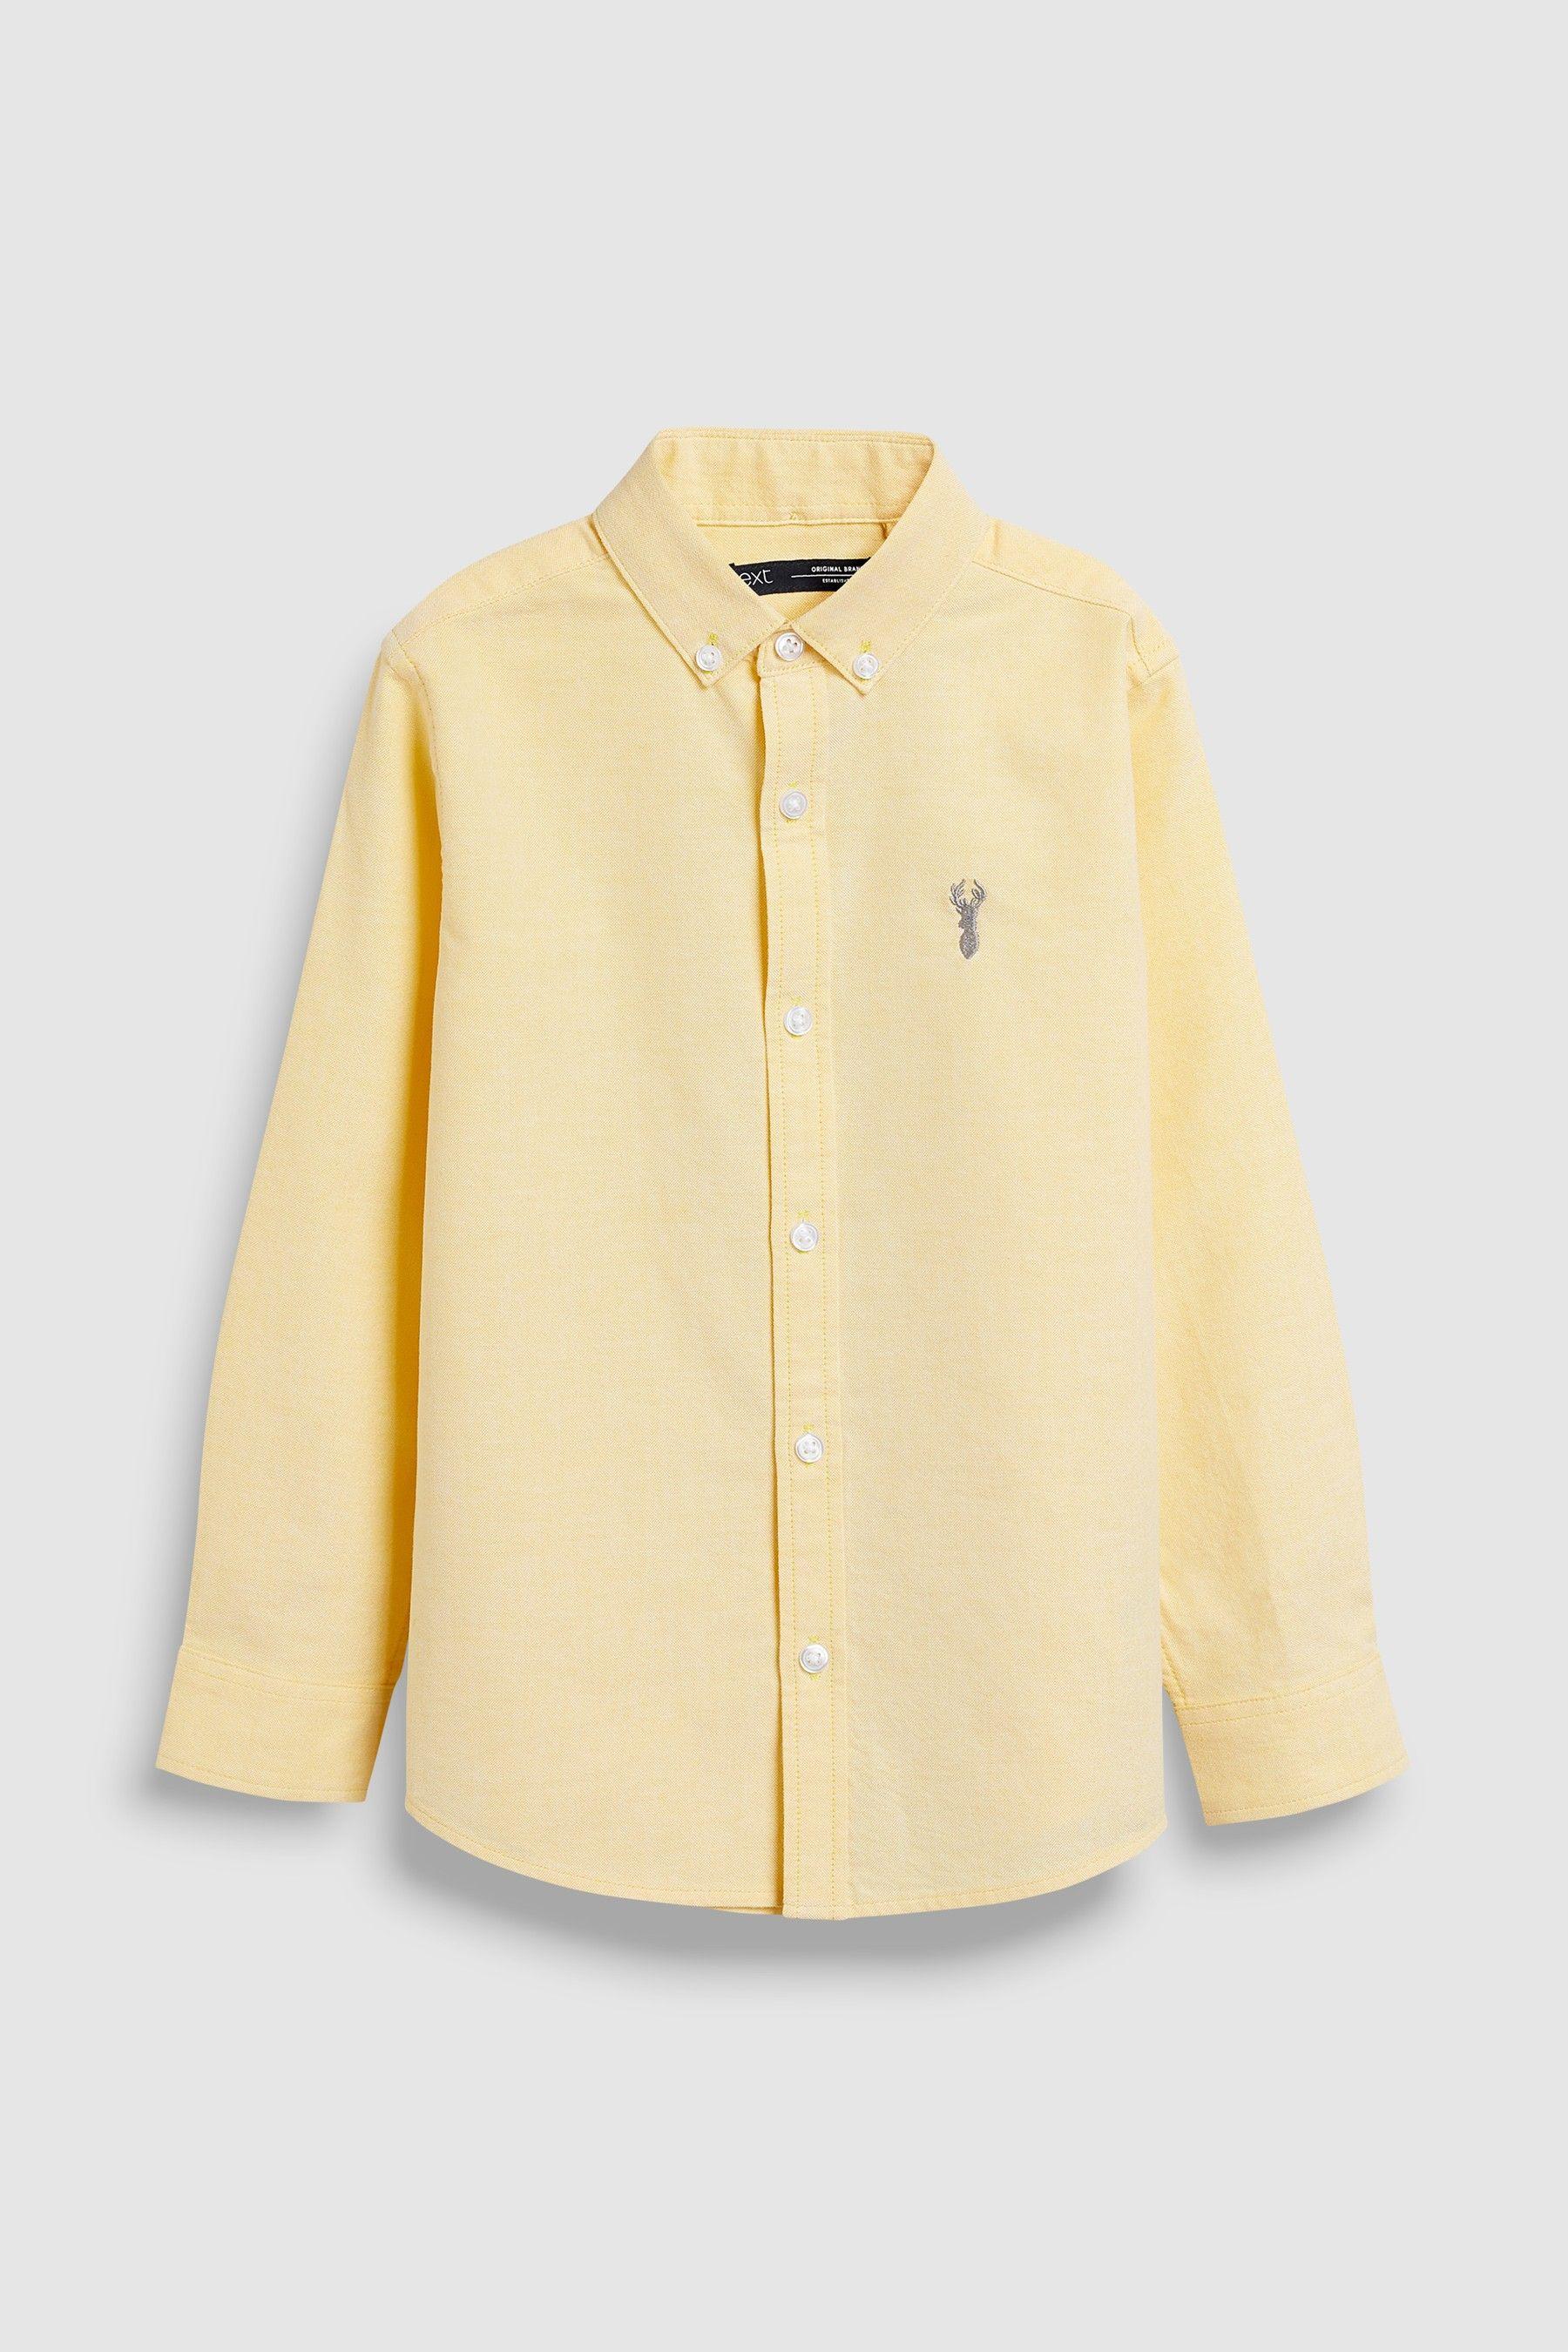 Blue Long Sleeve Oxford Shirt 3 16yrs